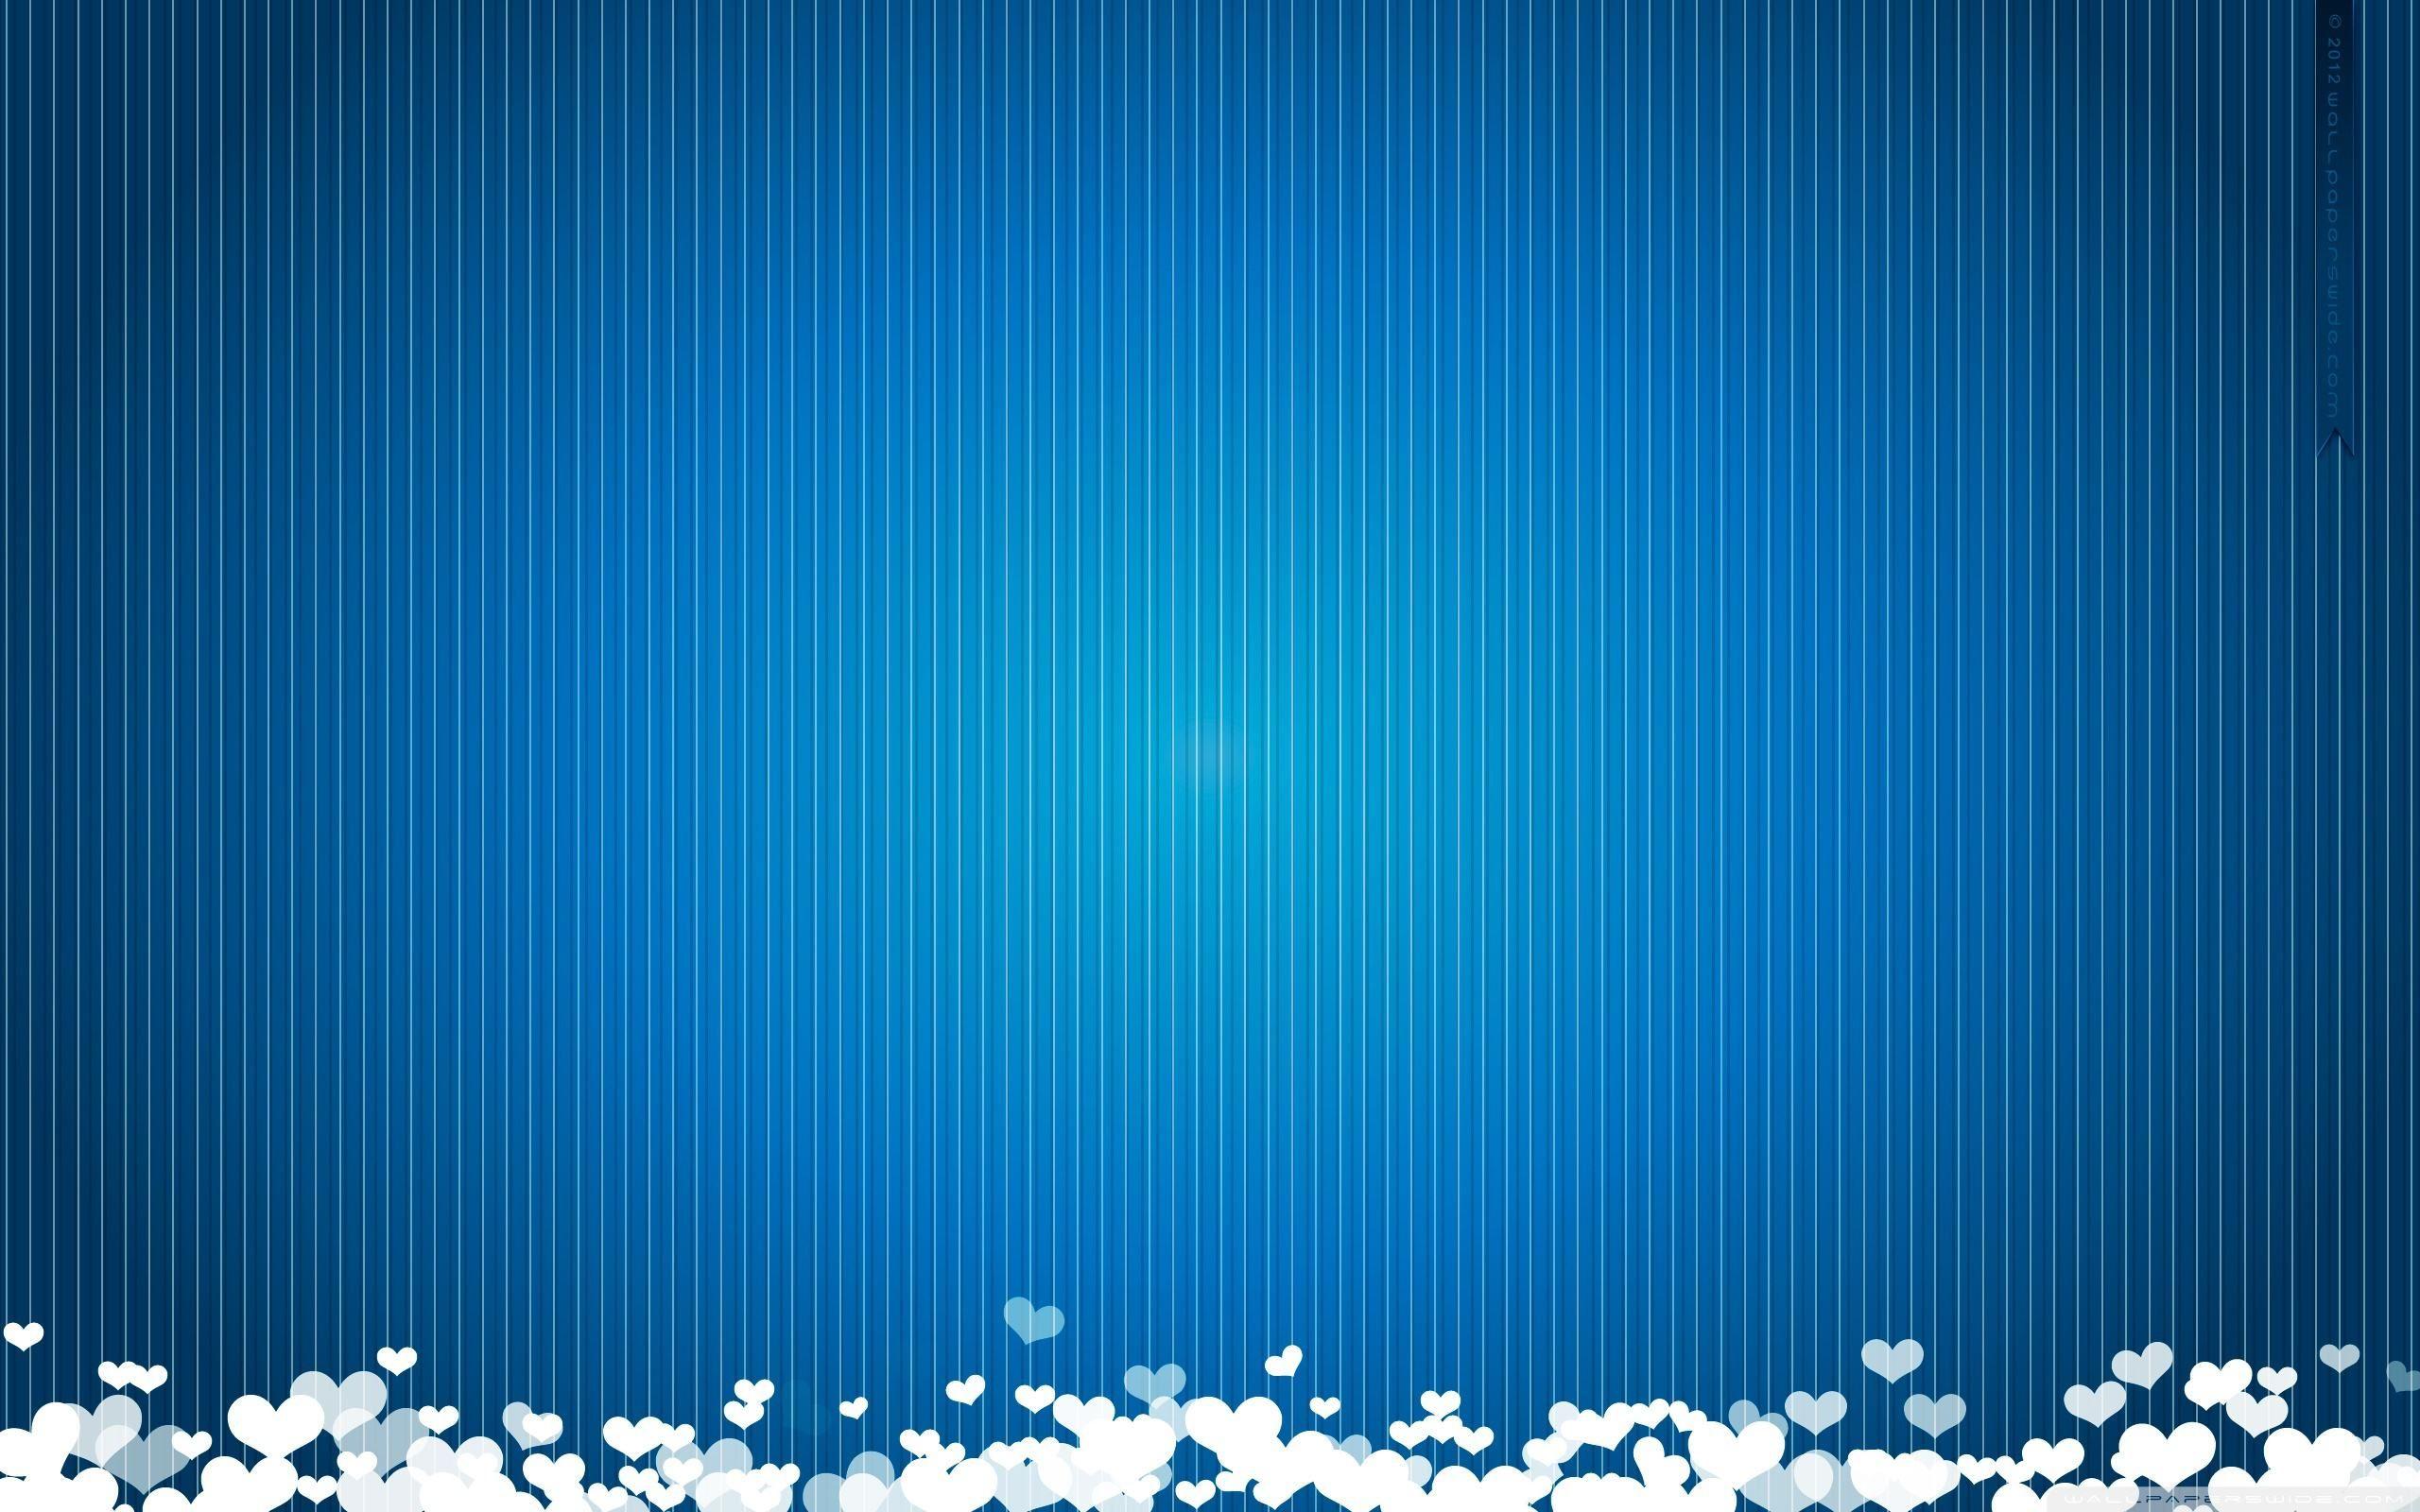 Good Wallpaper Love Blue - b48a26d4440f988bdb97289906fe3695  2018_873021.jpg